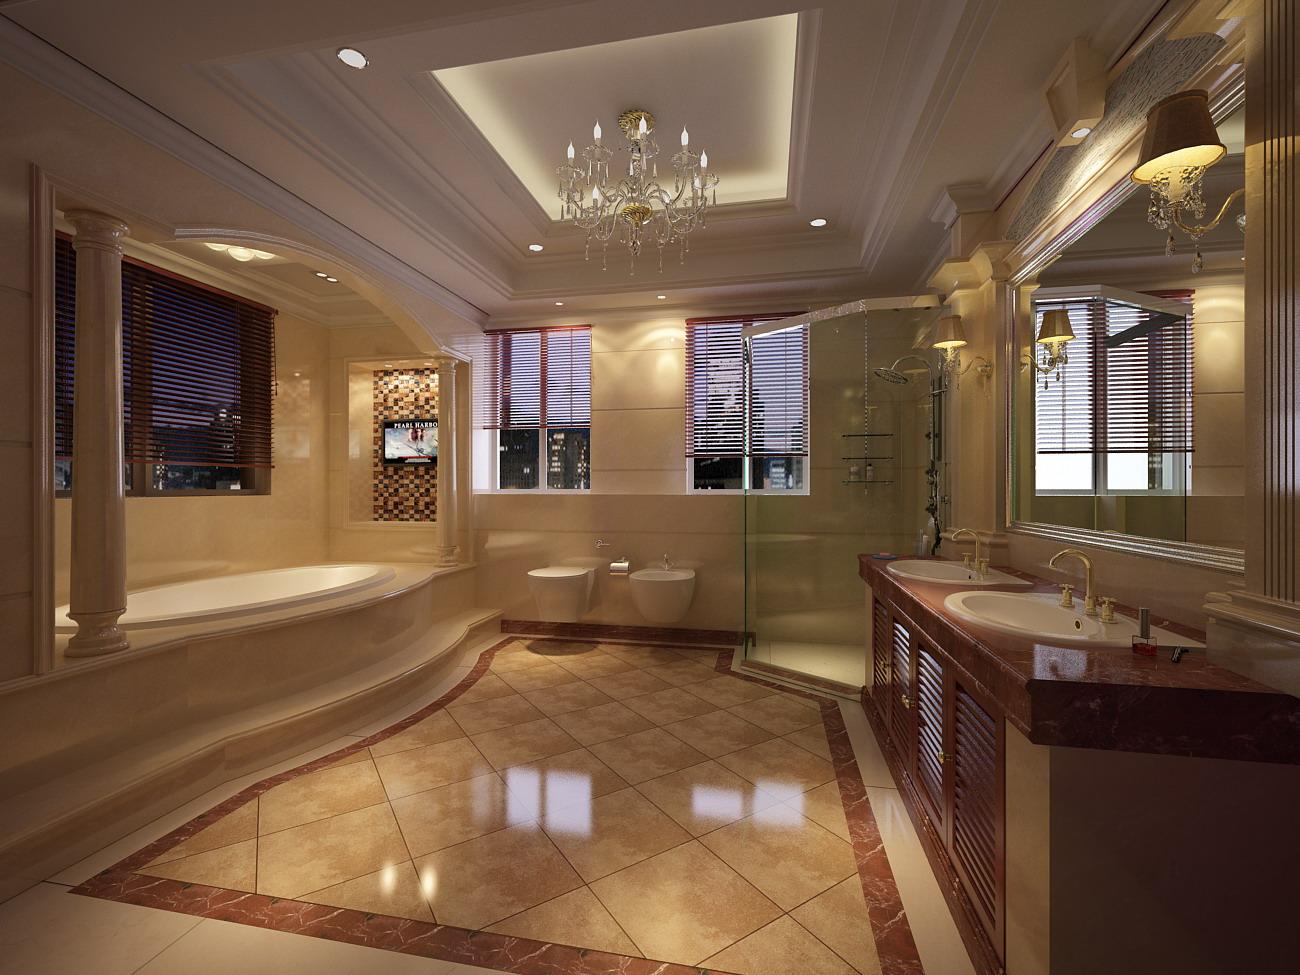 Marble Bathroom Floors. Marble Bathroom Floors Luxurious With Floor Model  Cgtrader Modern Ideas